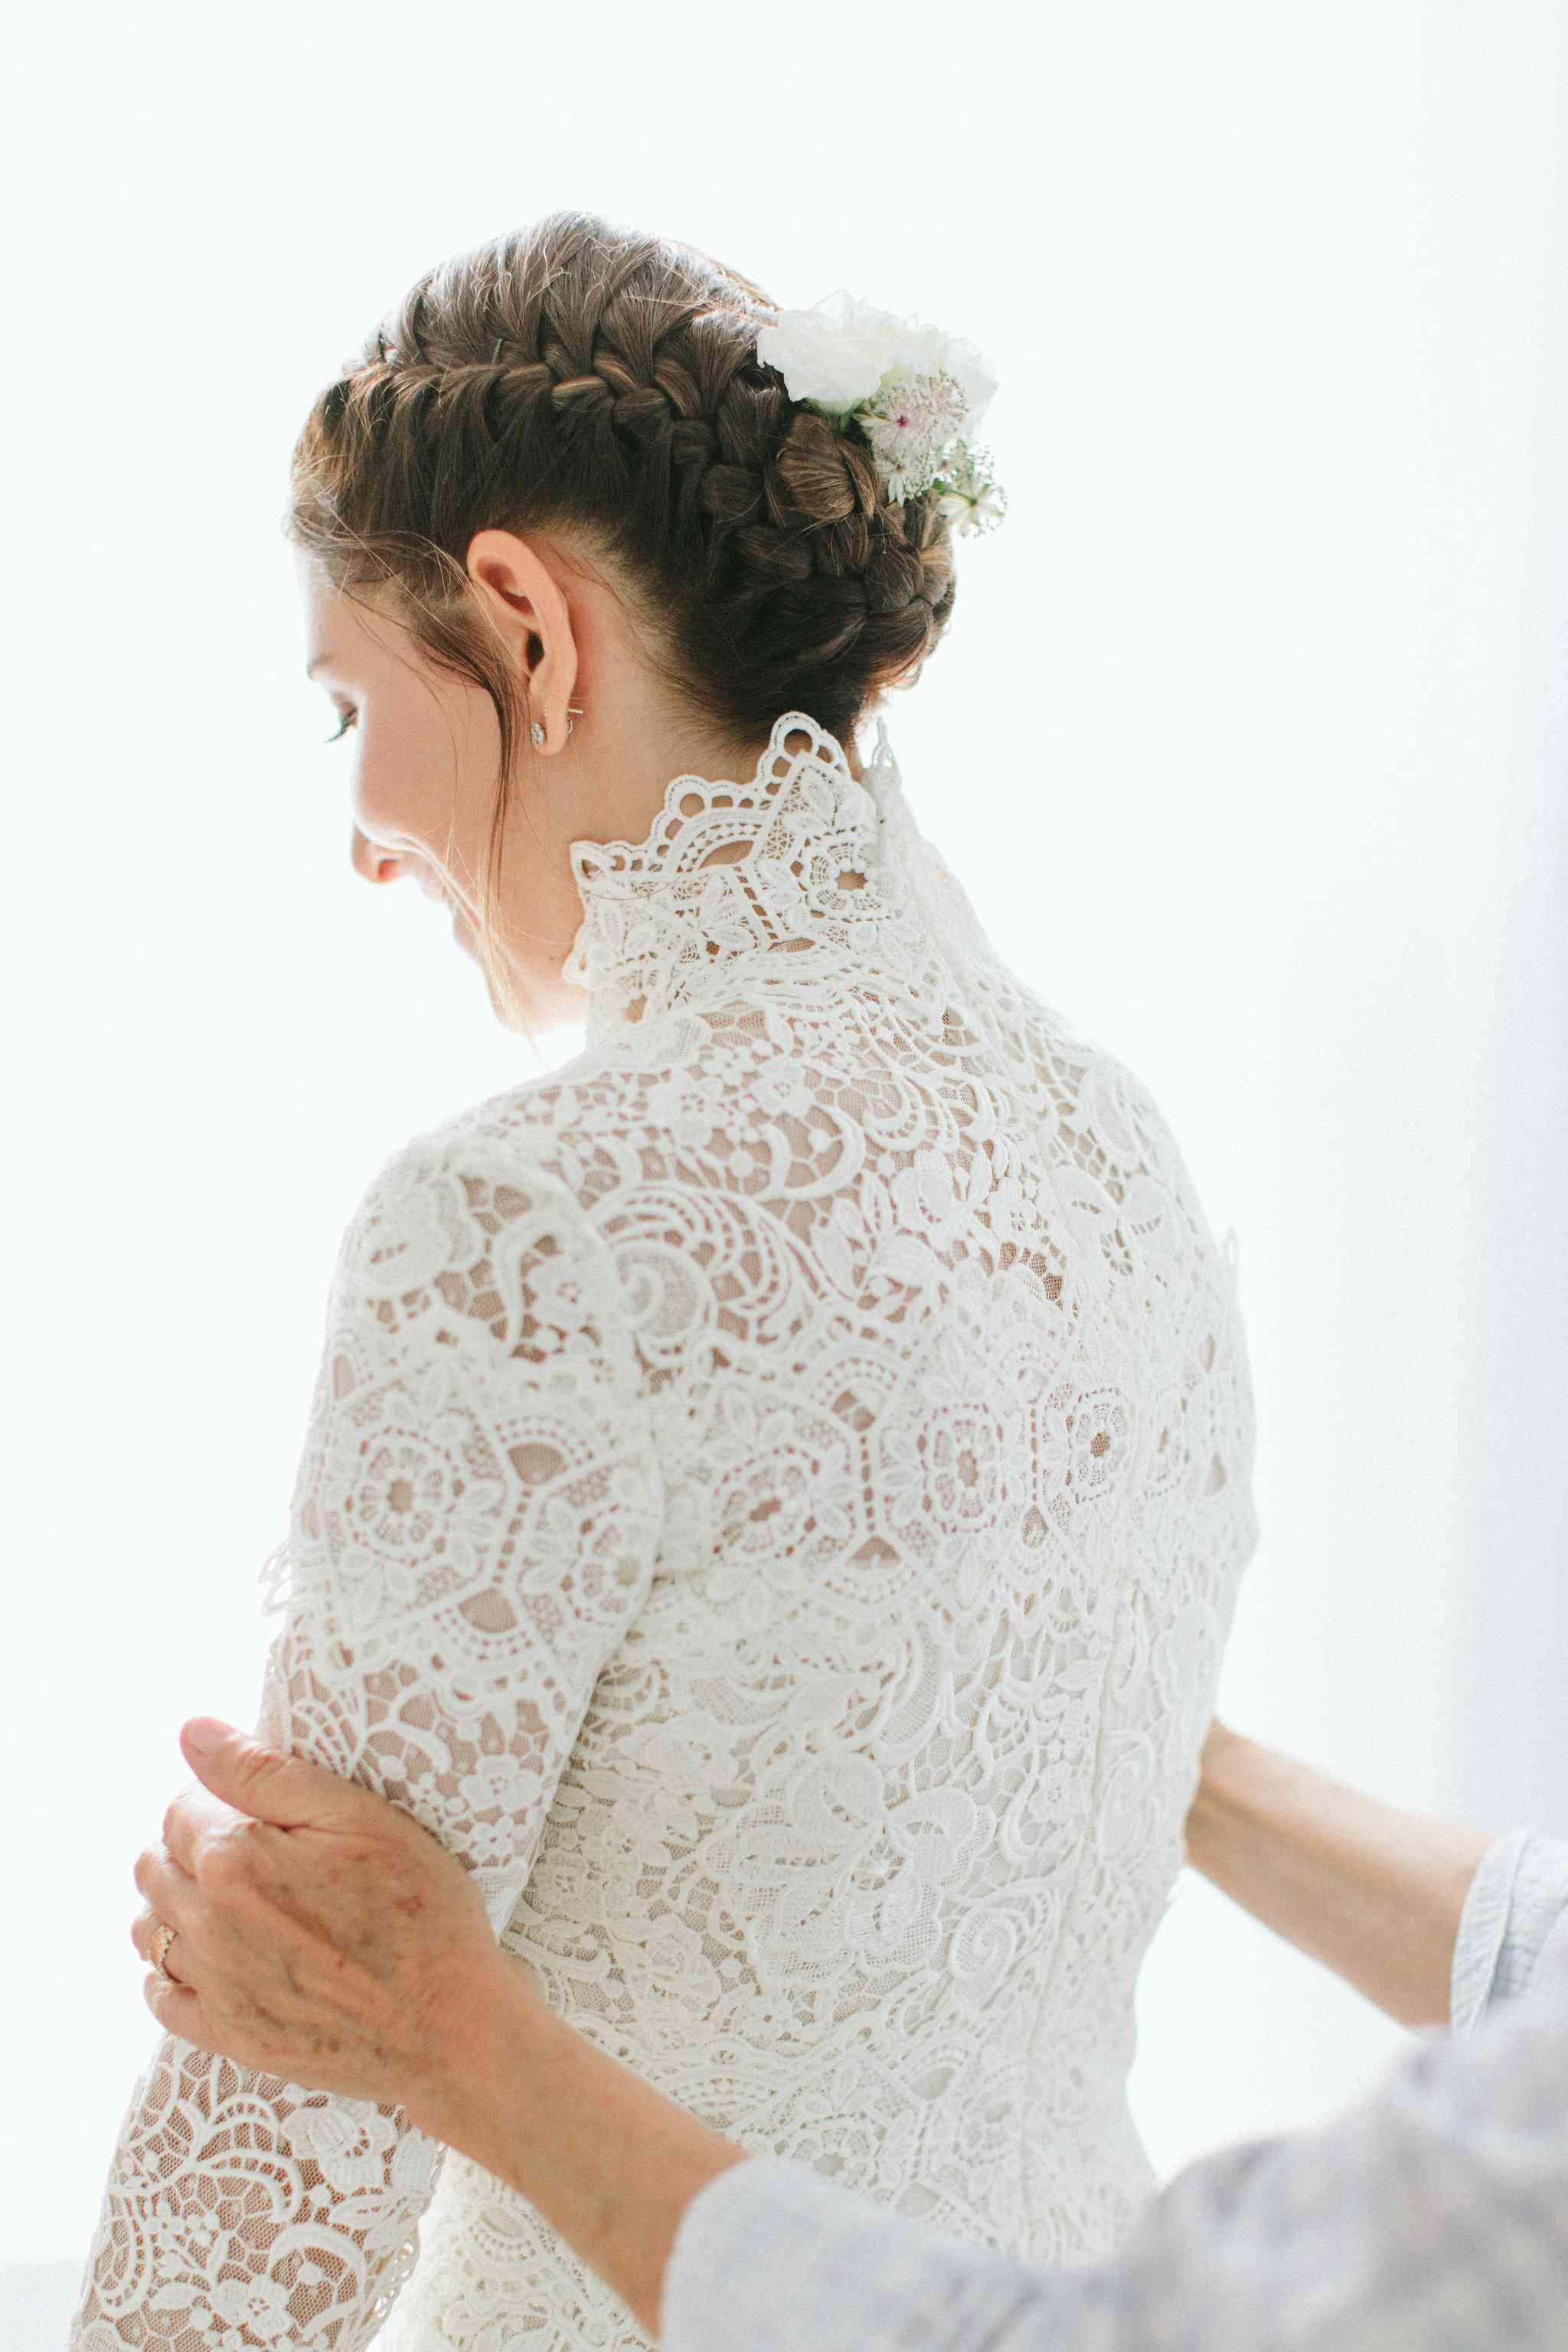 <p>lace wedding dress halo braid hairstyle</p>